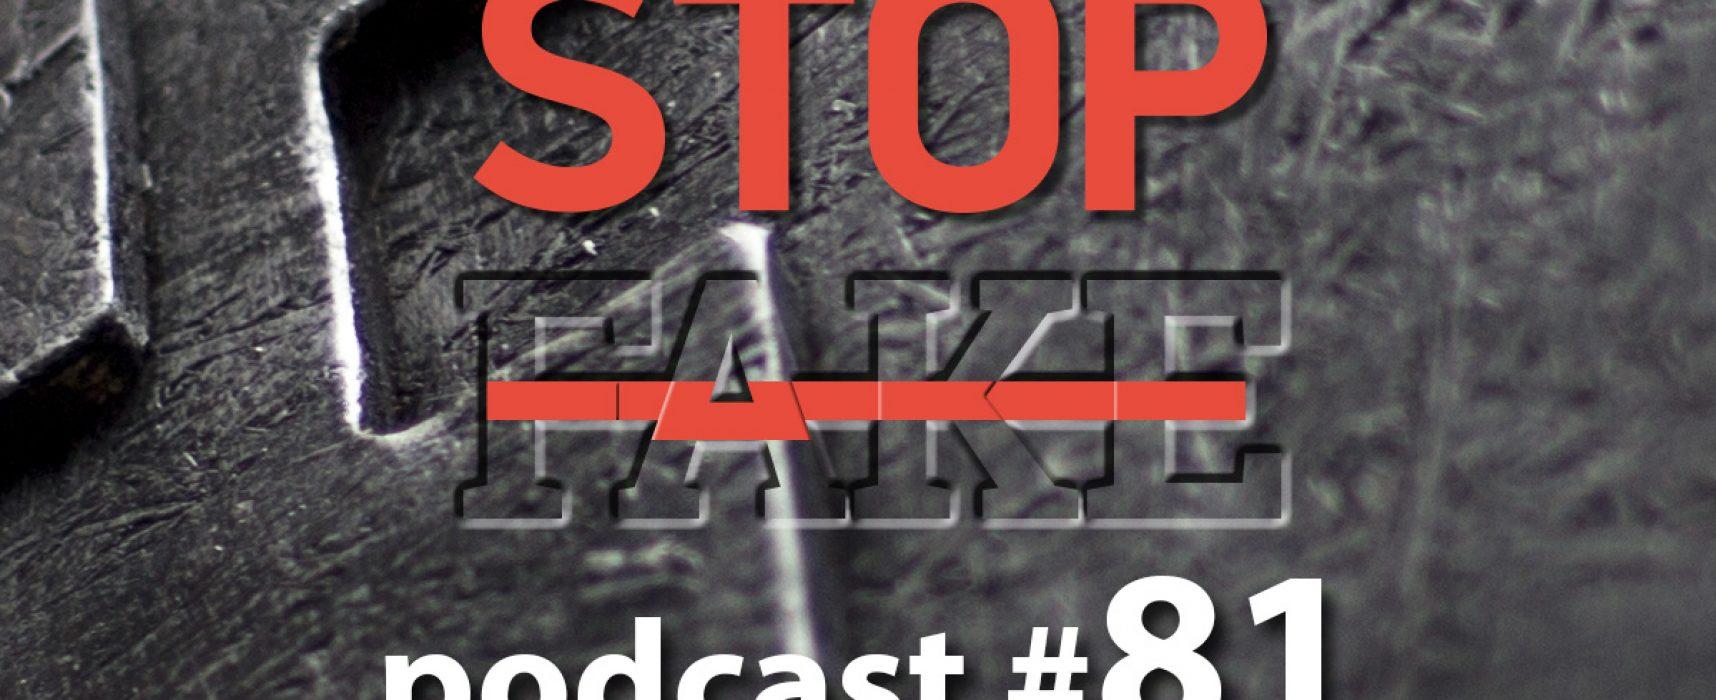 StopFake podcast #81